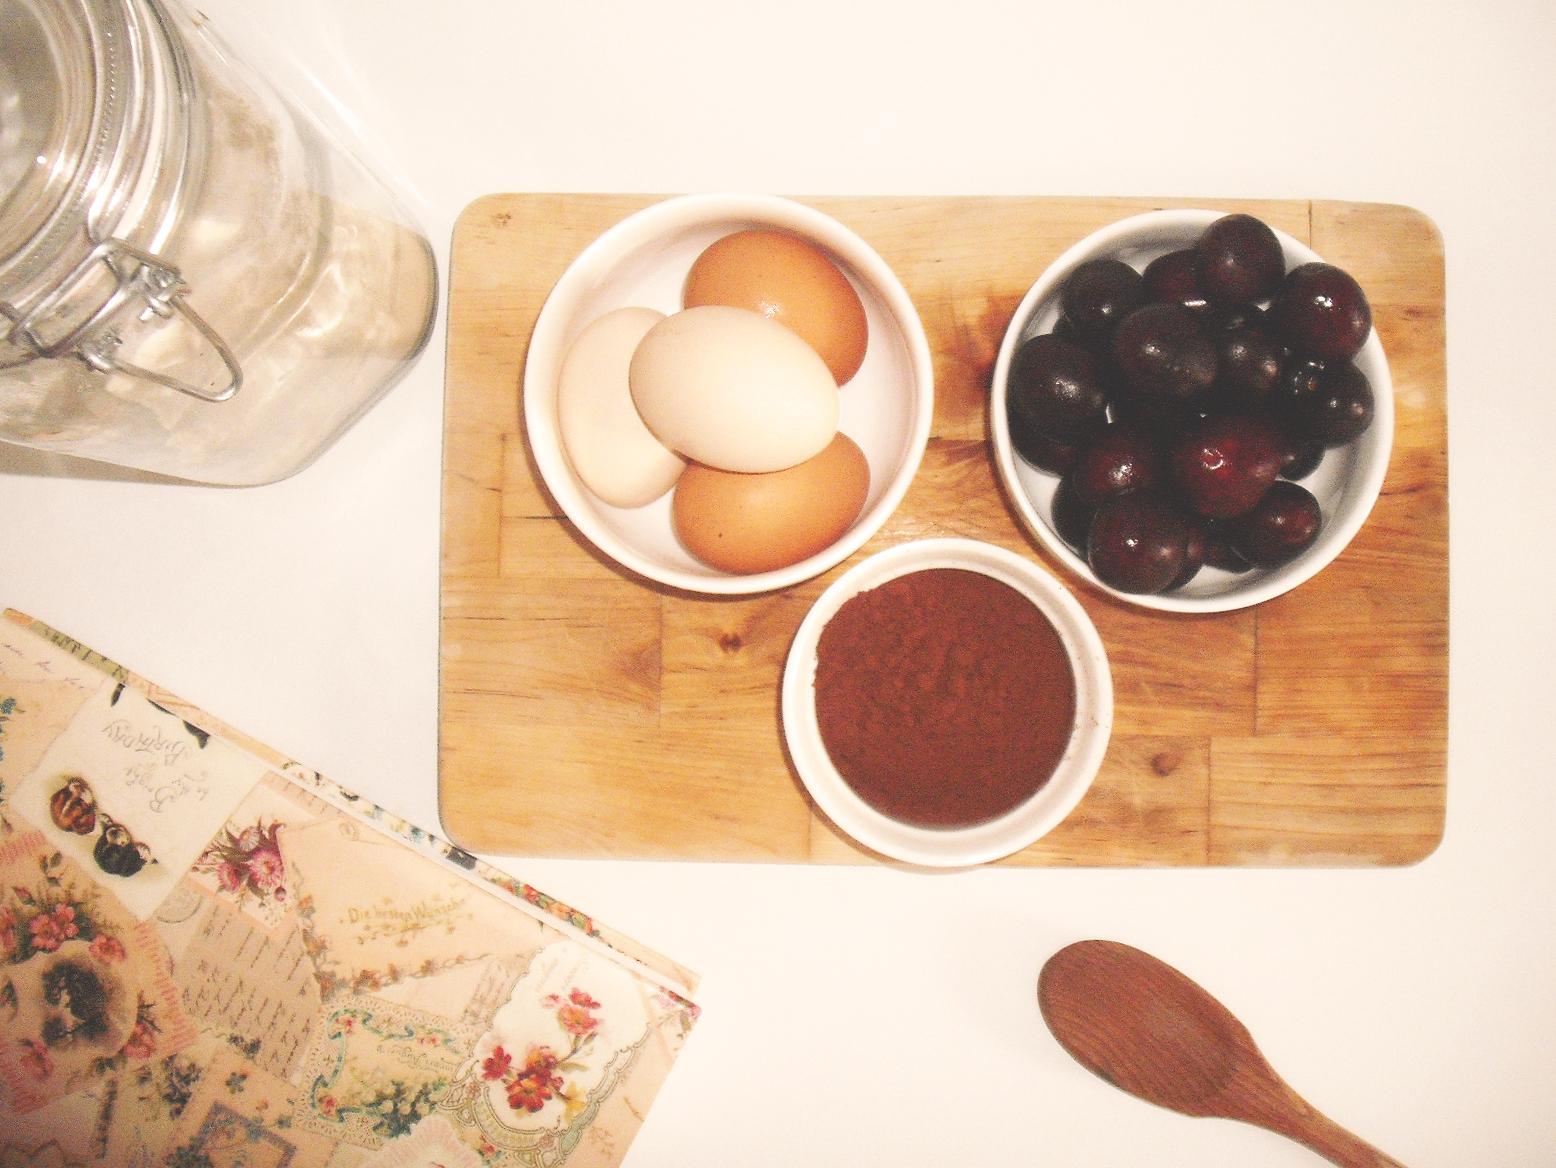 Chocolate cake ingredients recipe